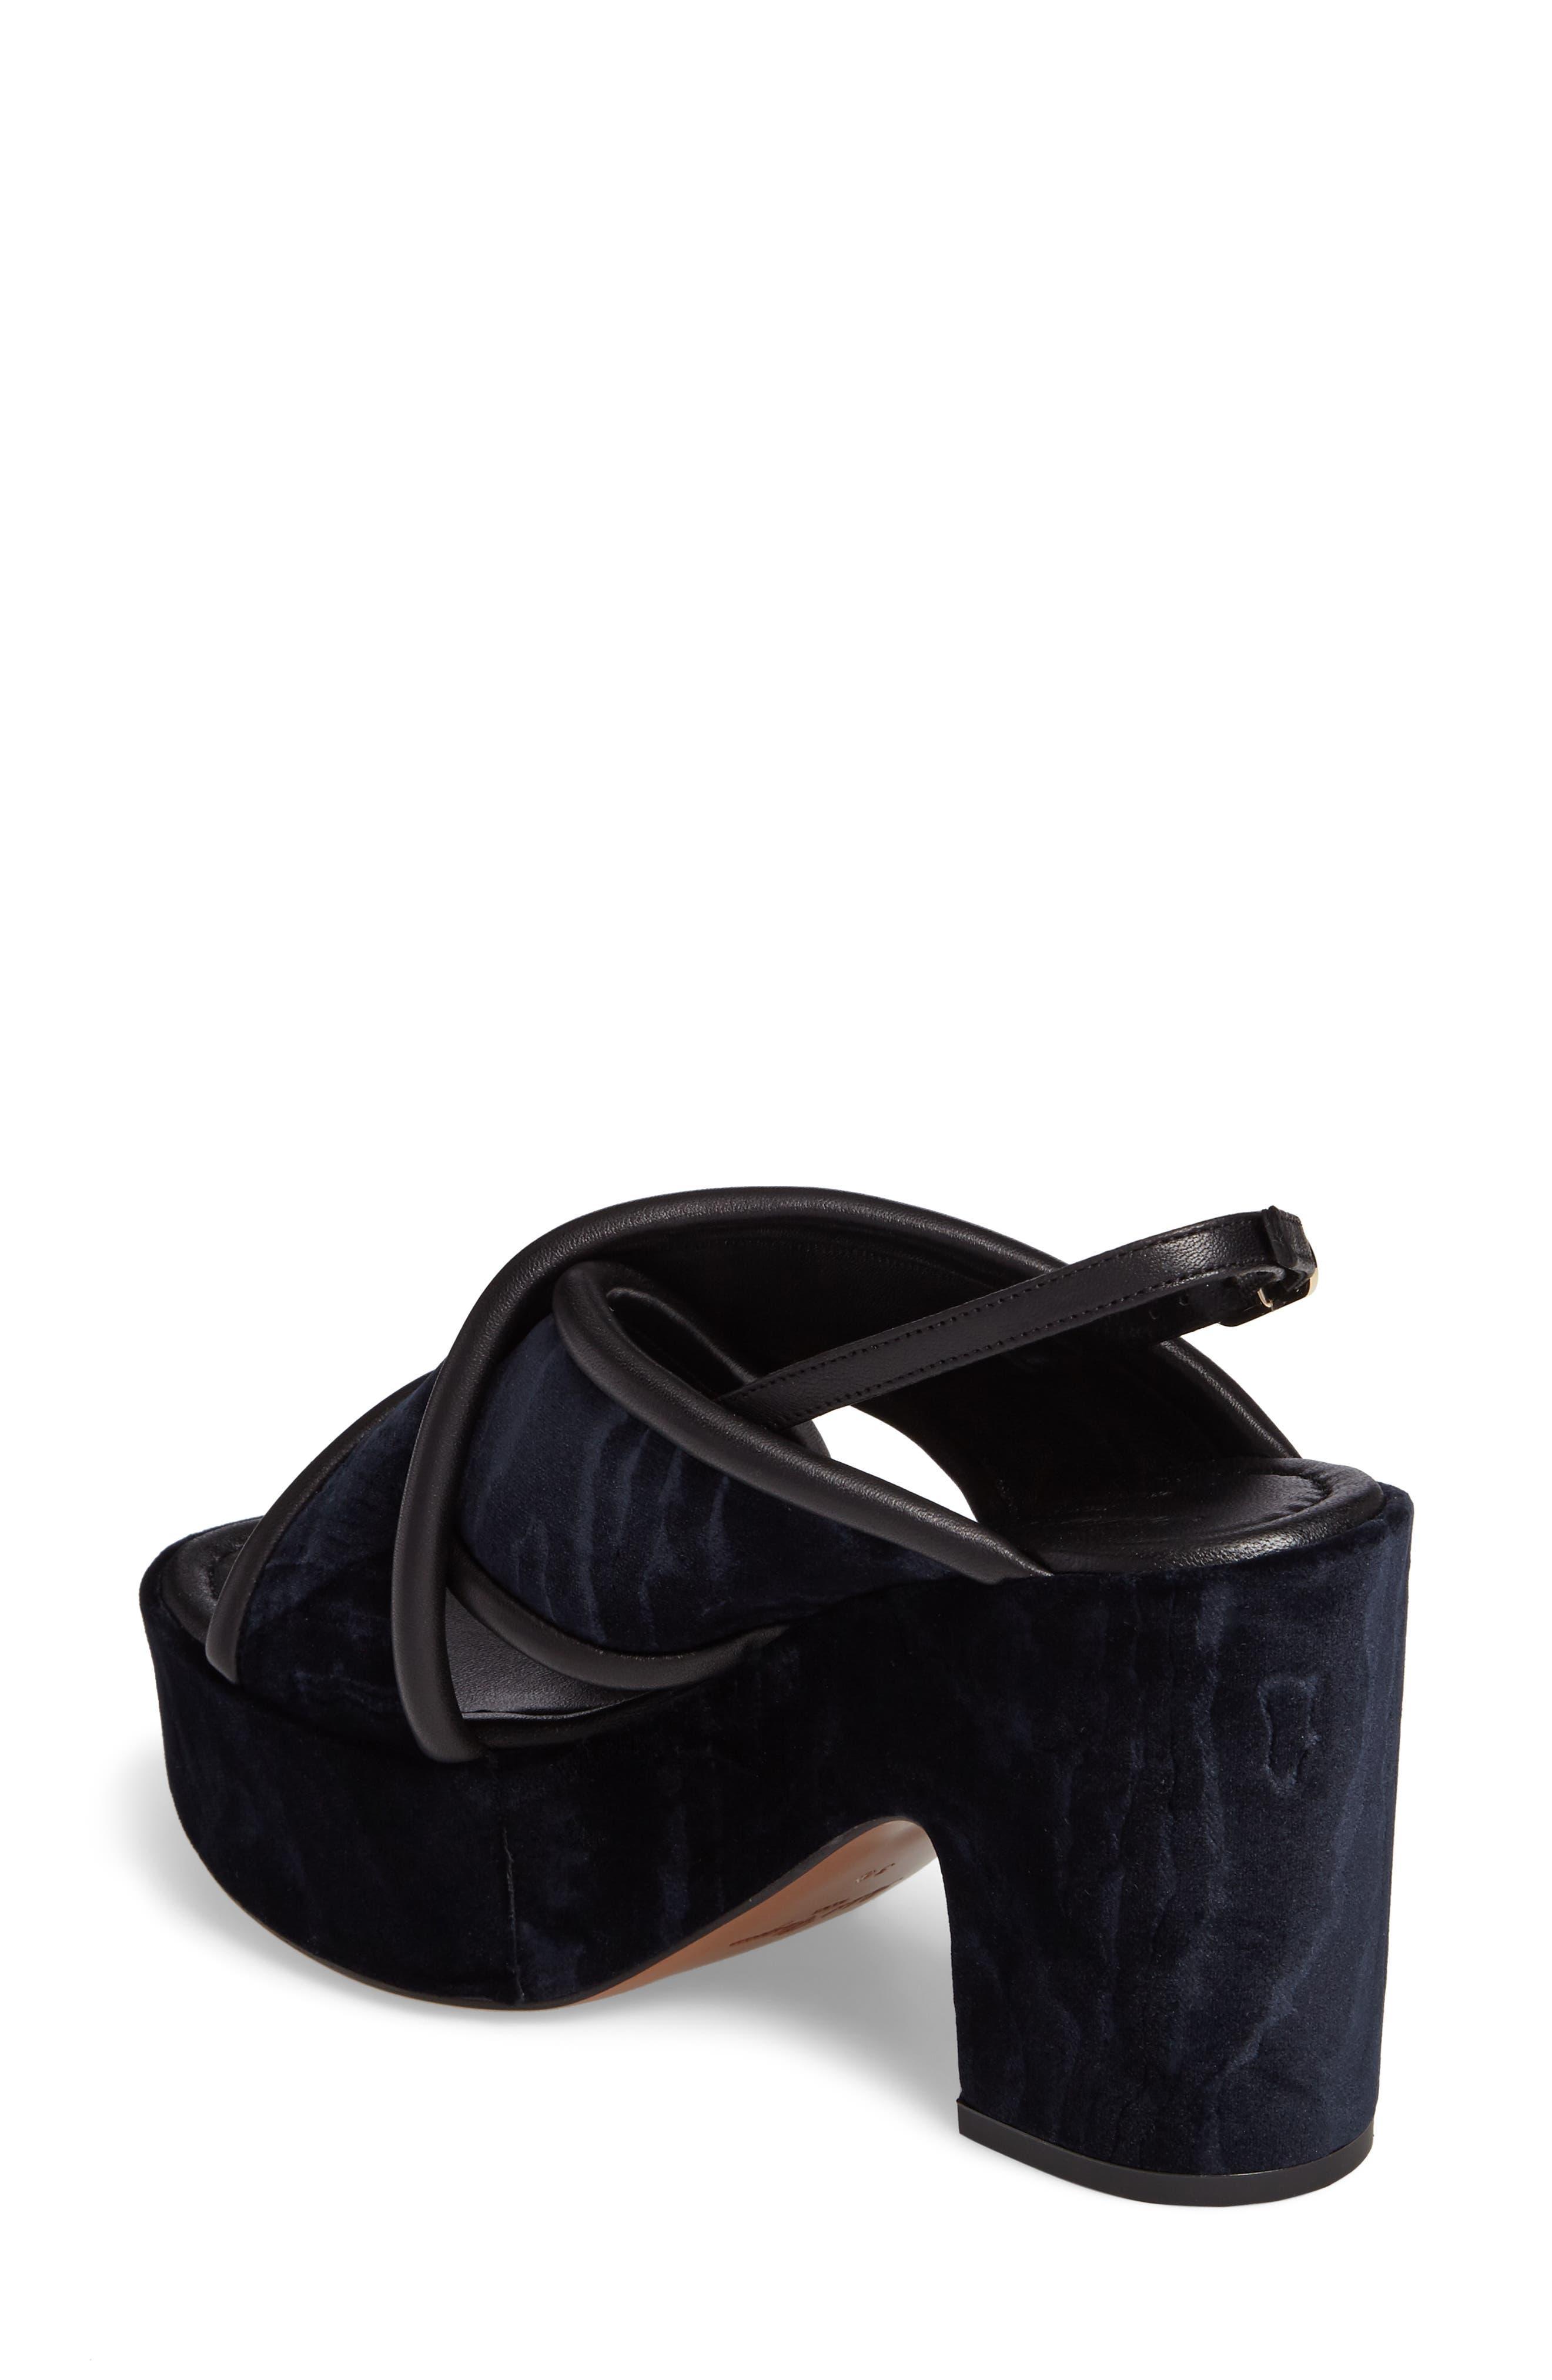 Emelinet Platform Sandal,                             Alternate thumbnail 2, color,                             400